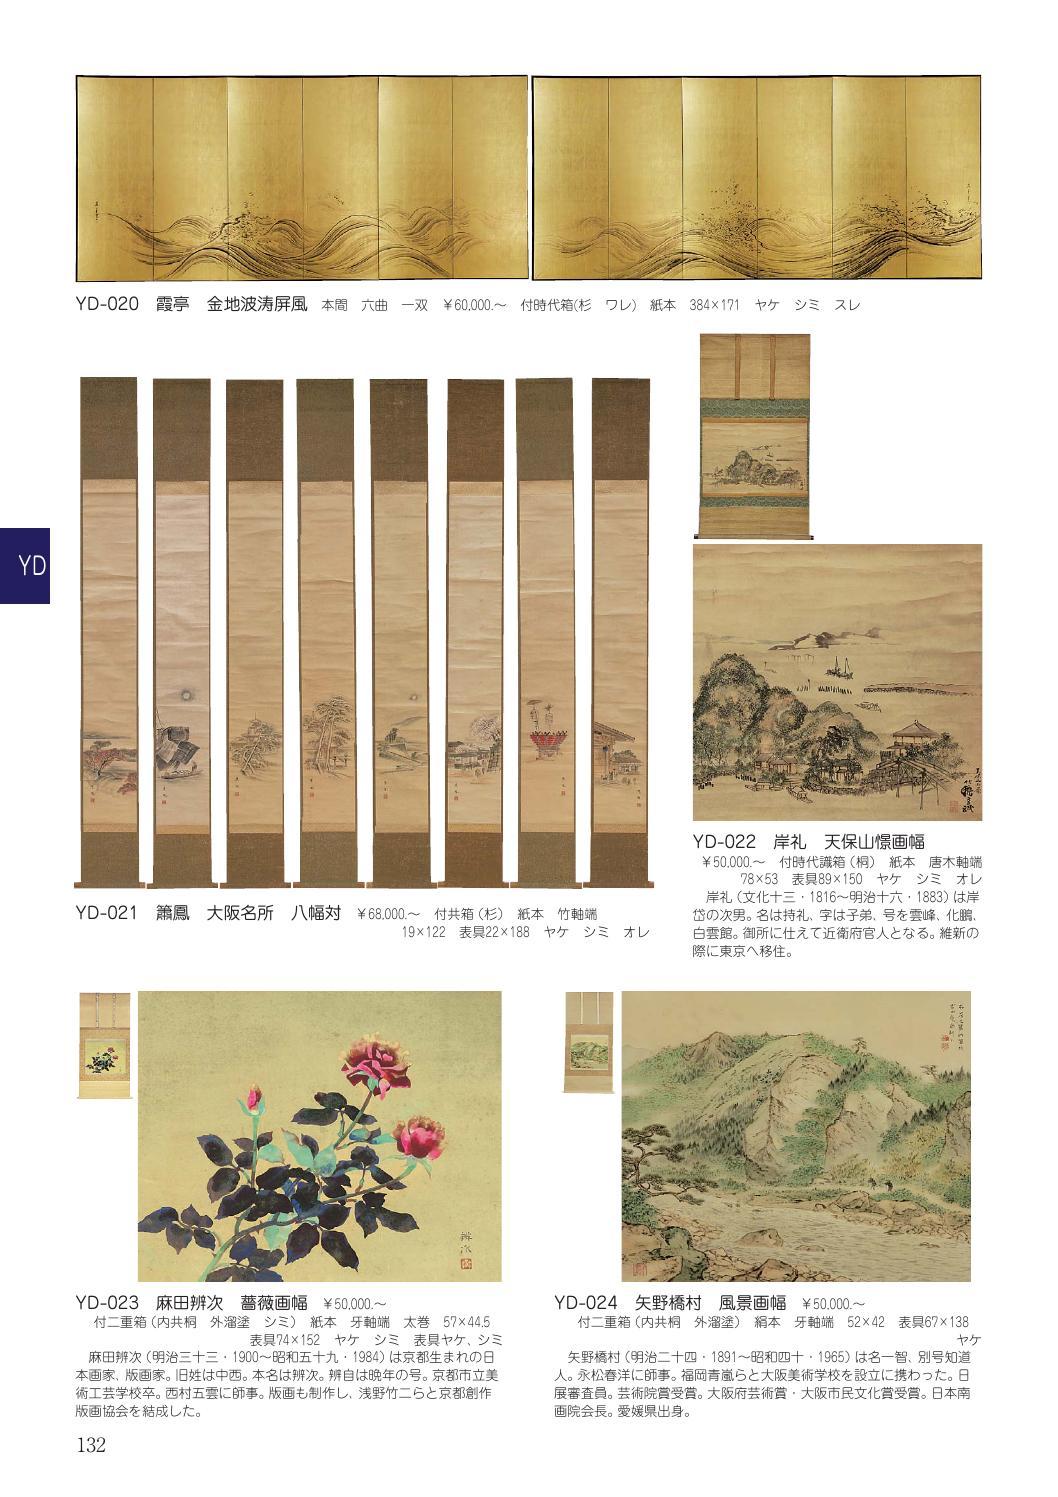 99th KOGIRE-KAI Silent Auction Catalog Vol.2 by KOGIRE-KAI - issuu